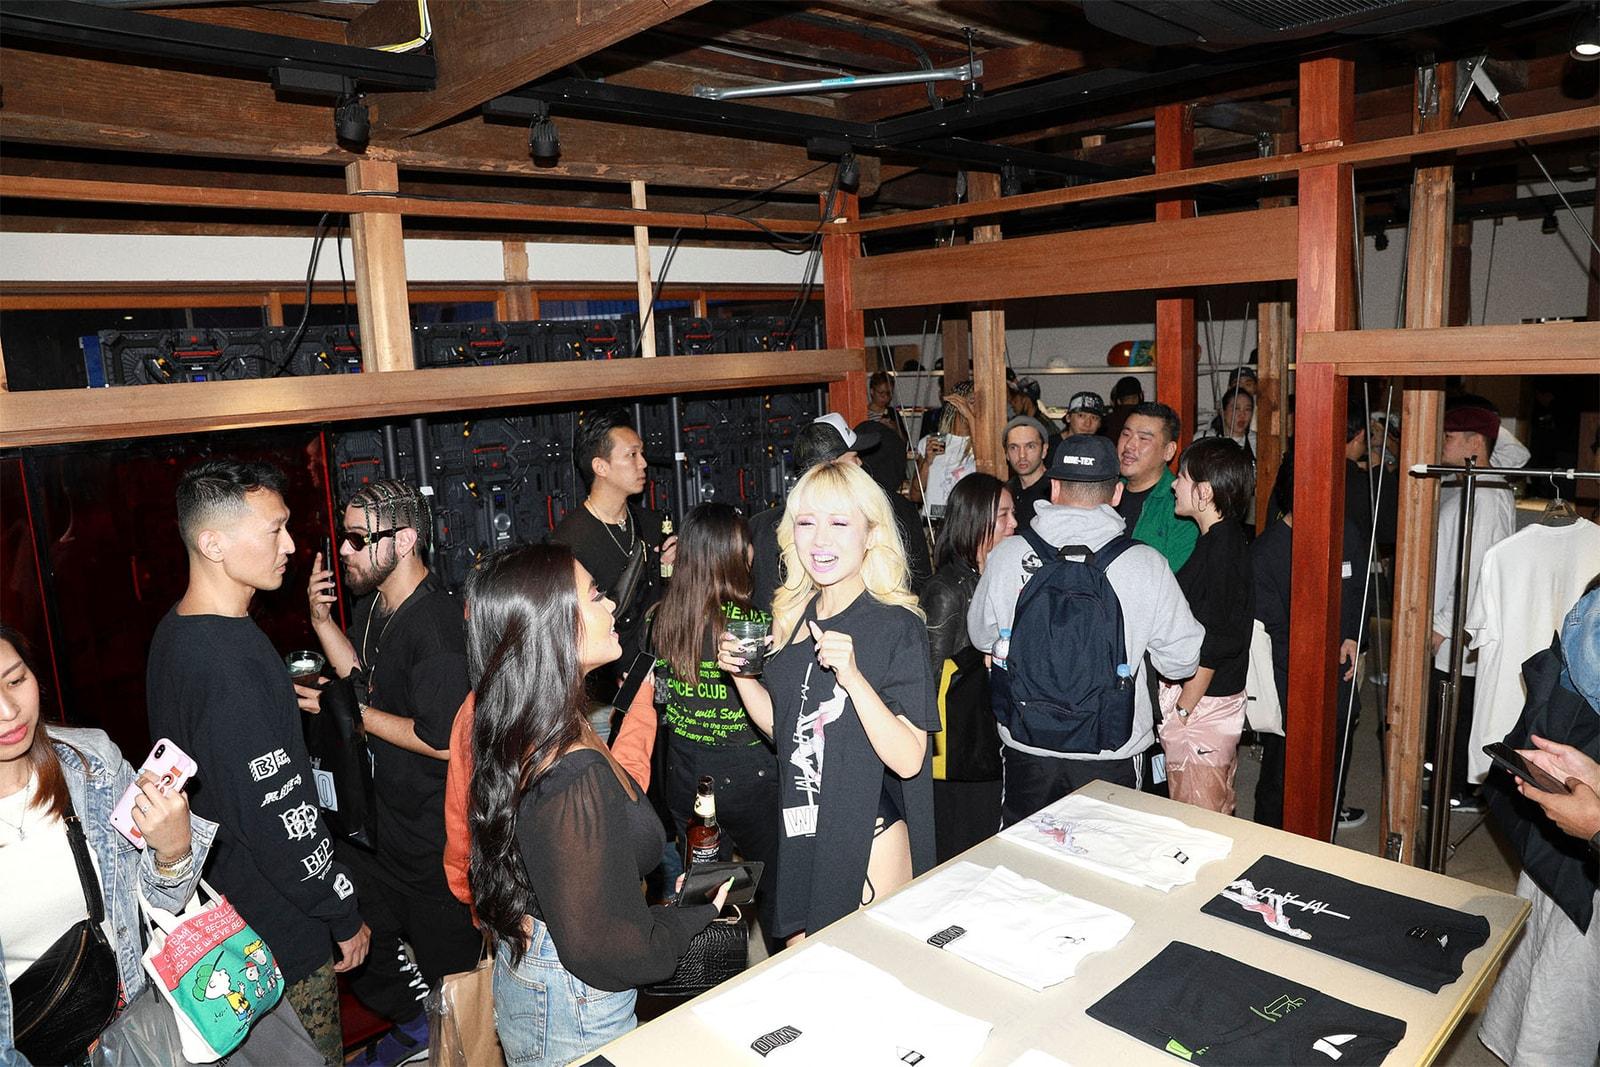 MADAM WOO TOKYO ドミサイル東京にてMADAM WOO TOKYO1周年のポップアップが開催 DOMICILE TOKYO 空山基によるセクシーロボットダンサー